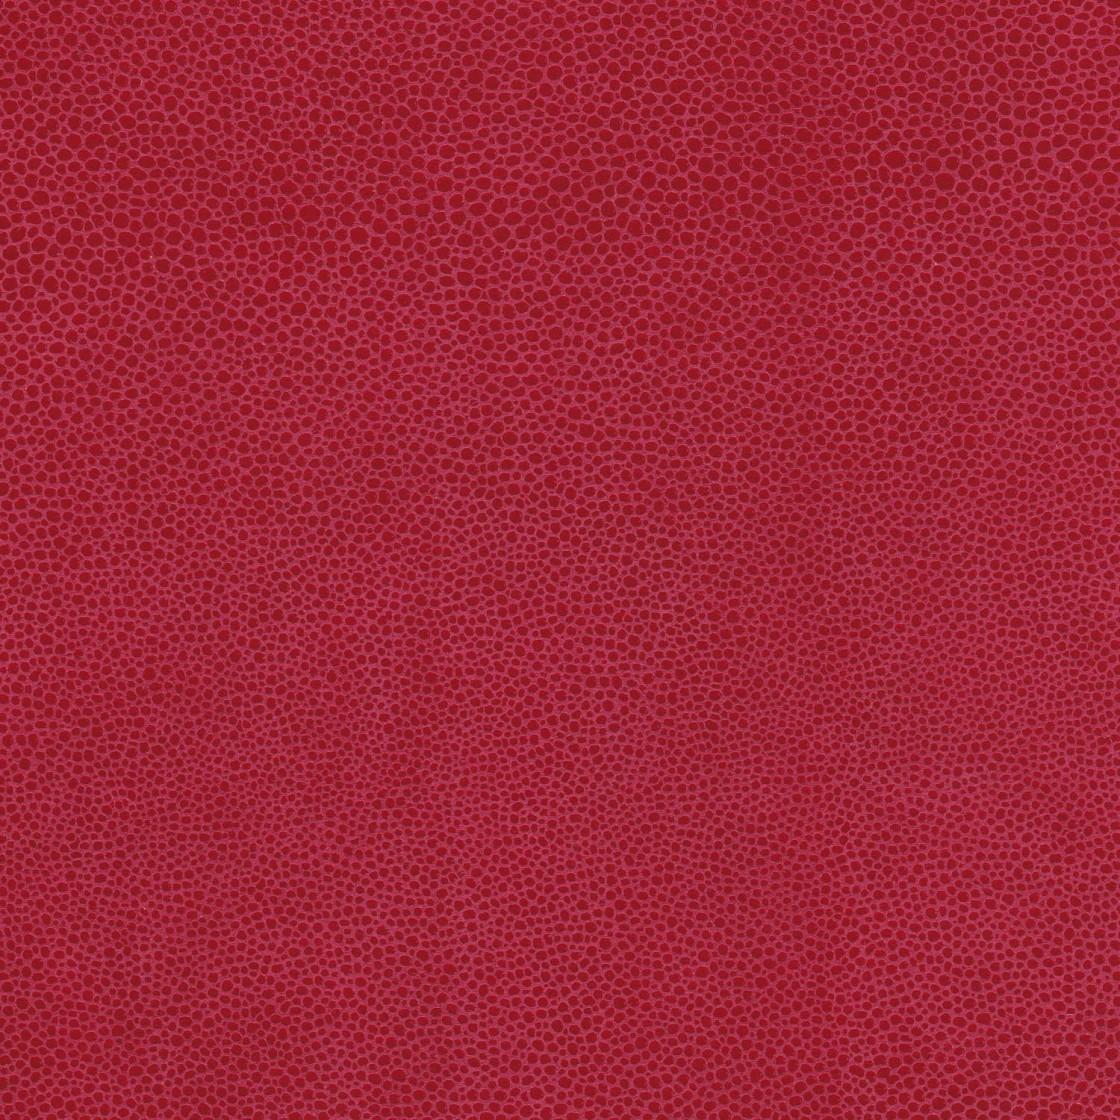 Magma 10/12 - Velours imprimé, 6 coloris.